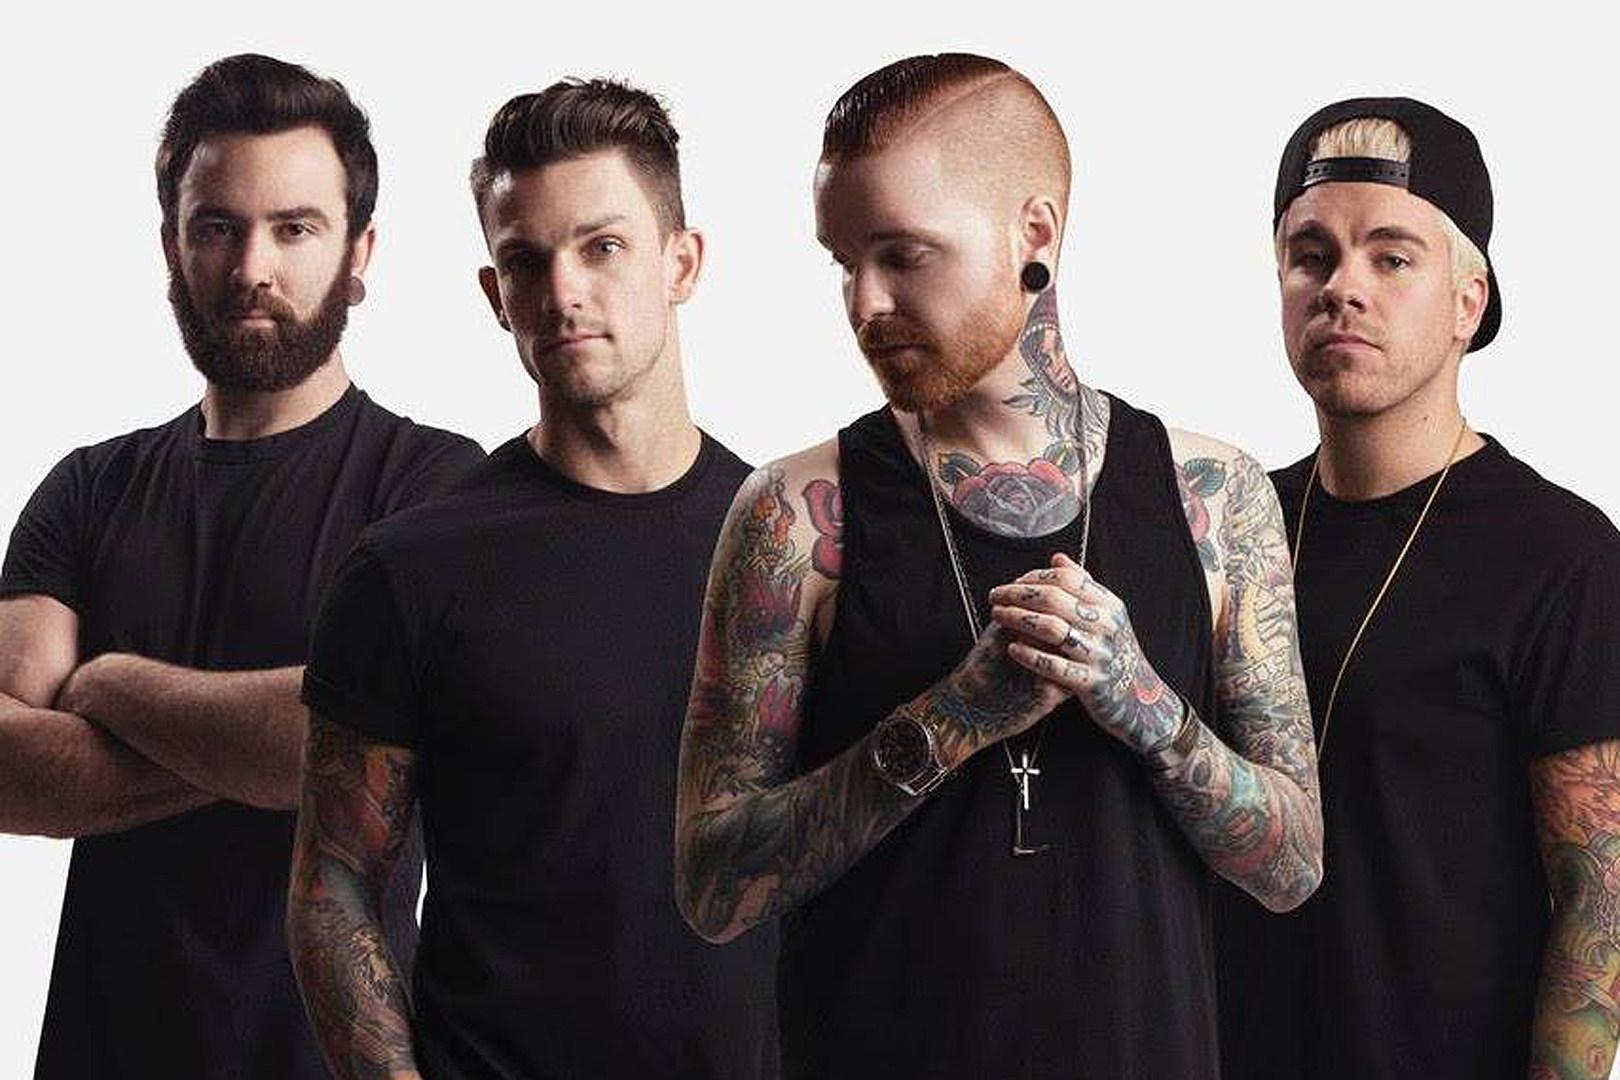 Memphis May Fire Announce 'Broken' Album + Unleash New Single 'The Old Me'